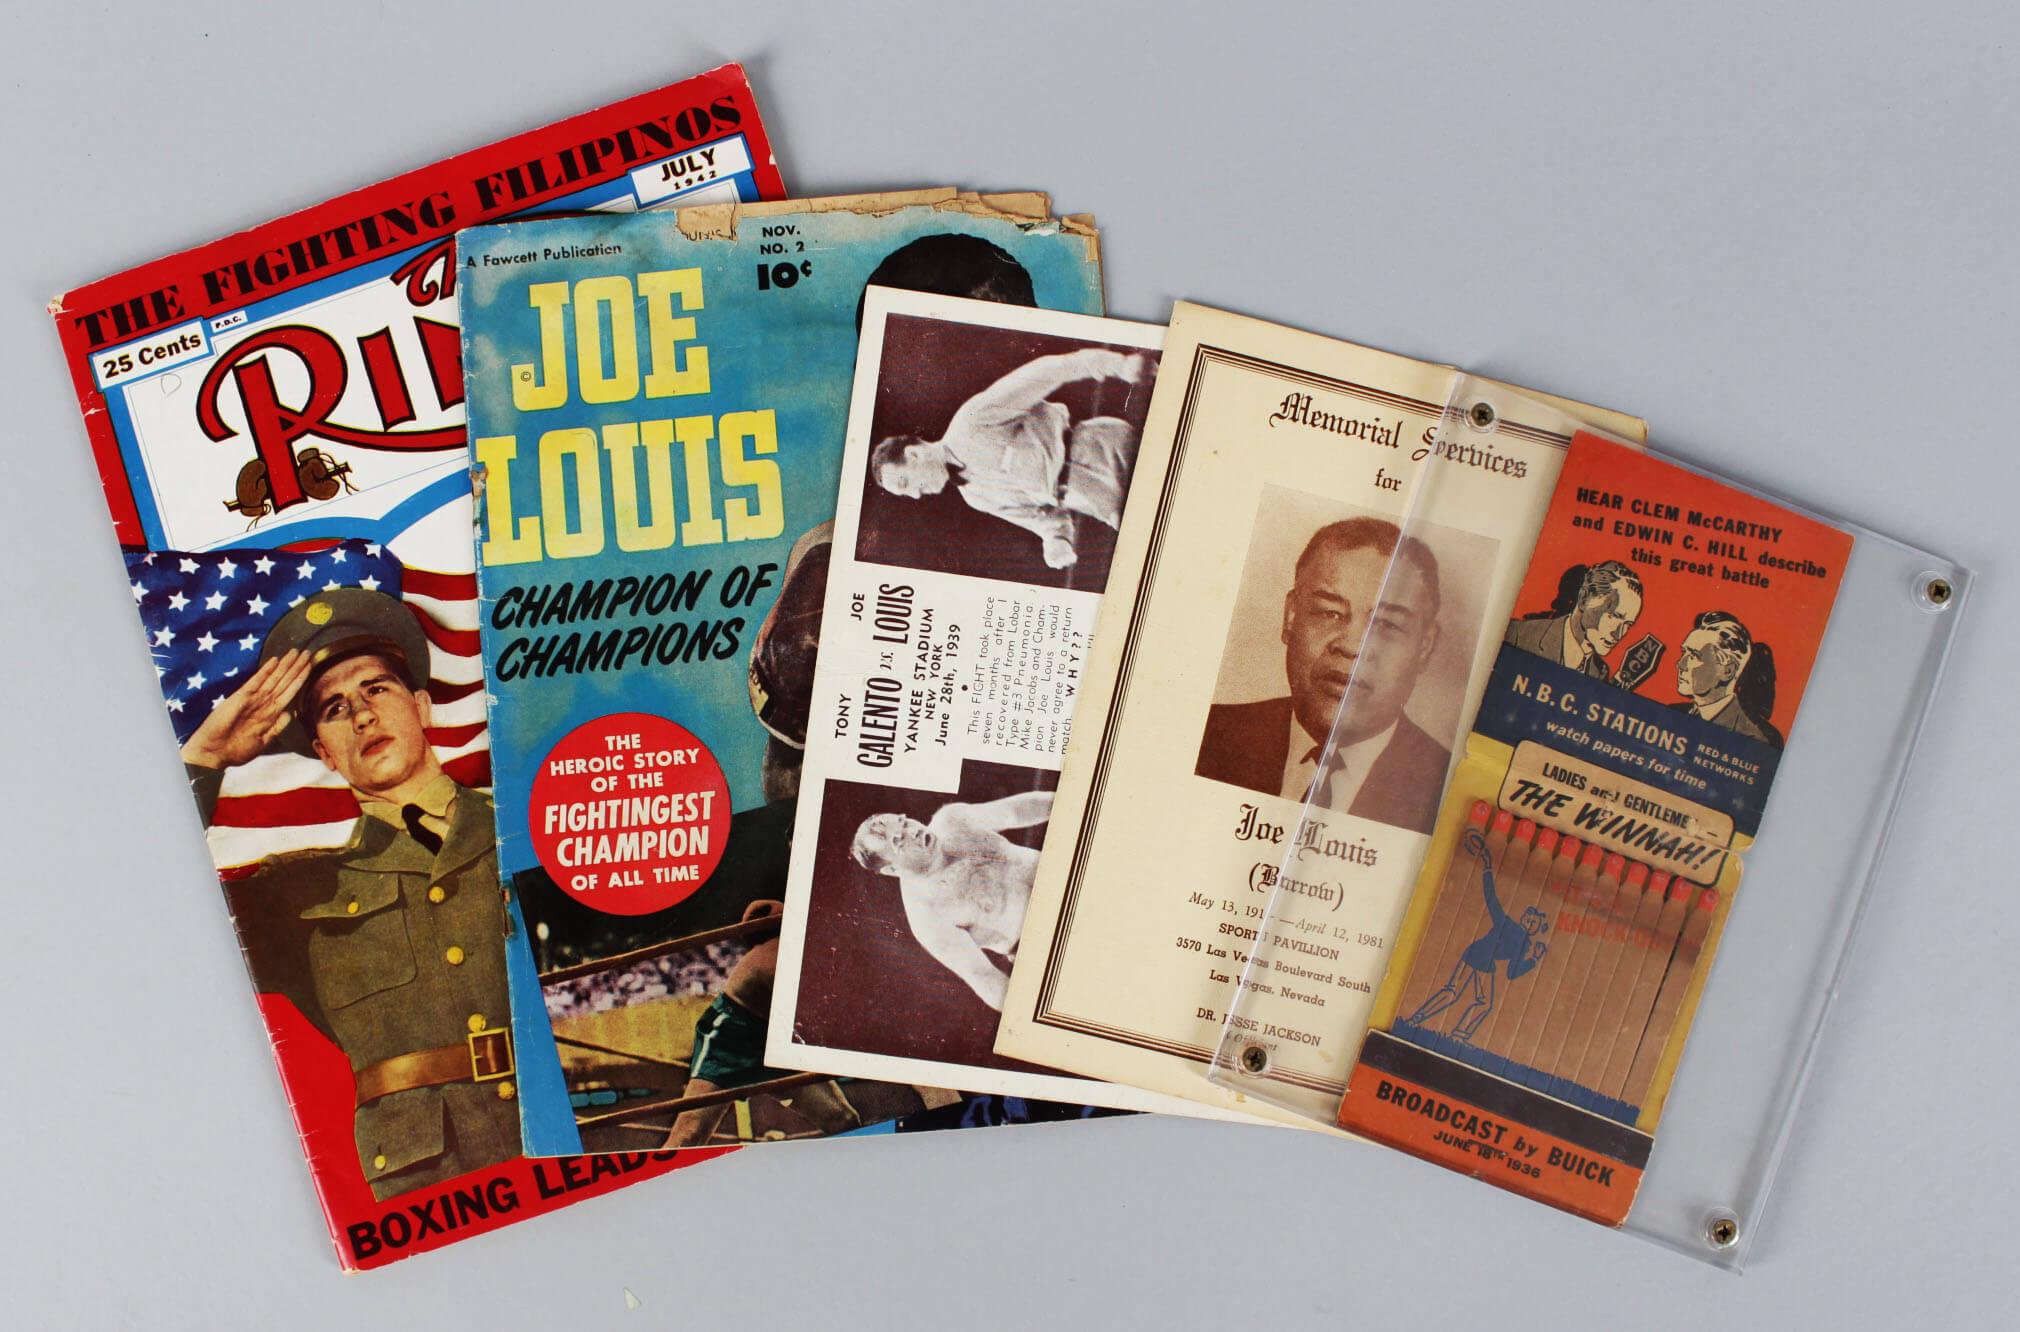 Boxing Legend Joe Louis Lot – (2) Magazines, Post Card, Memorial Service Program & 1936 Biggest Match Book61103_01